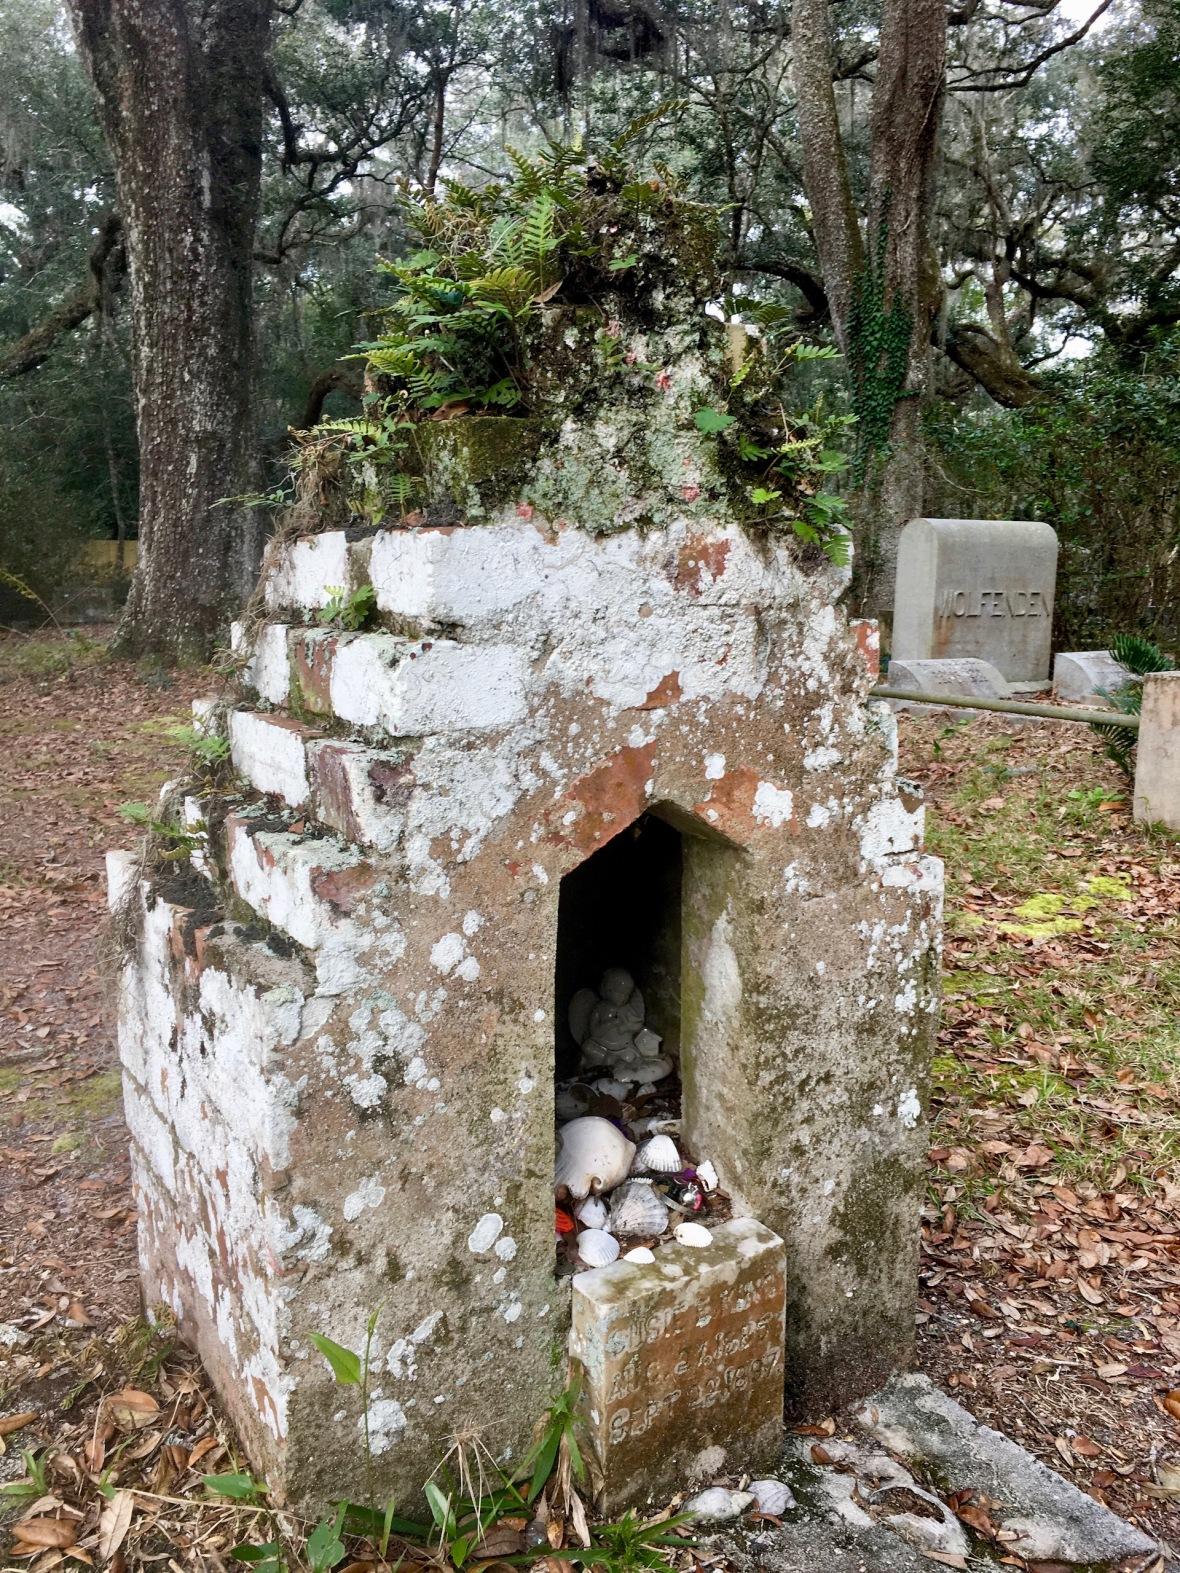 Gravesite in Historic cemetery in Micanopy, Florida